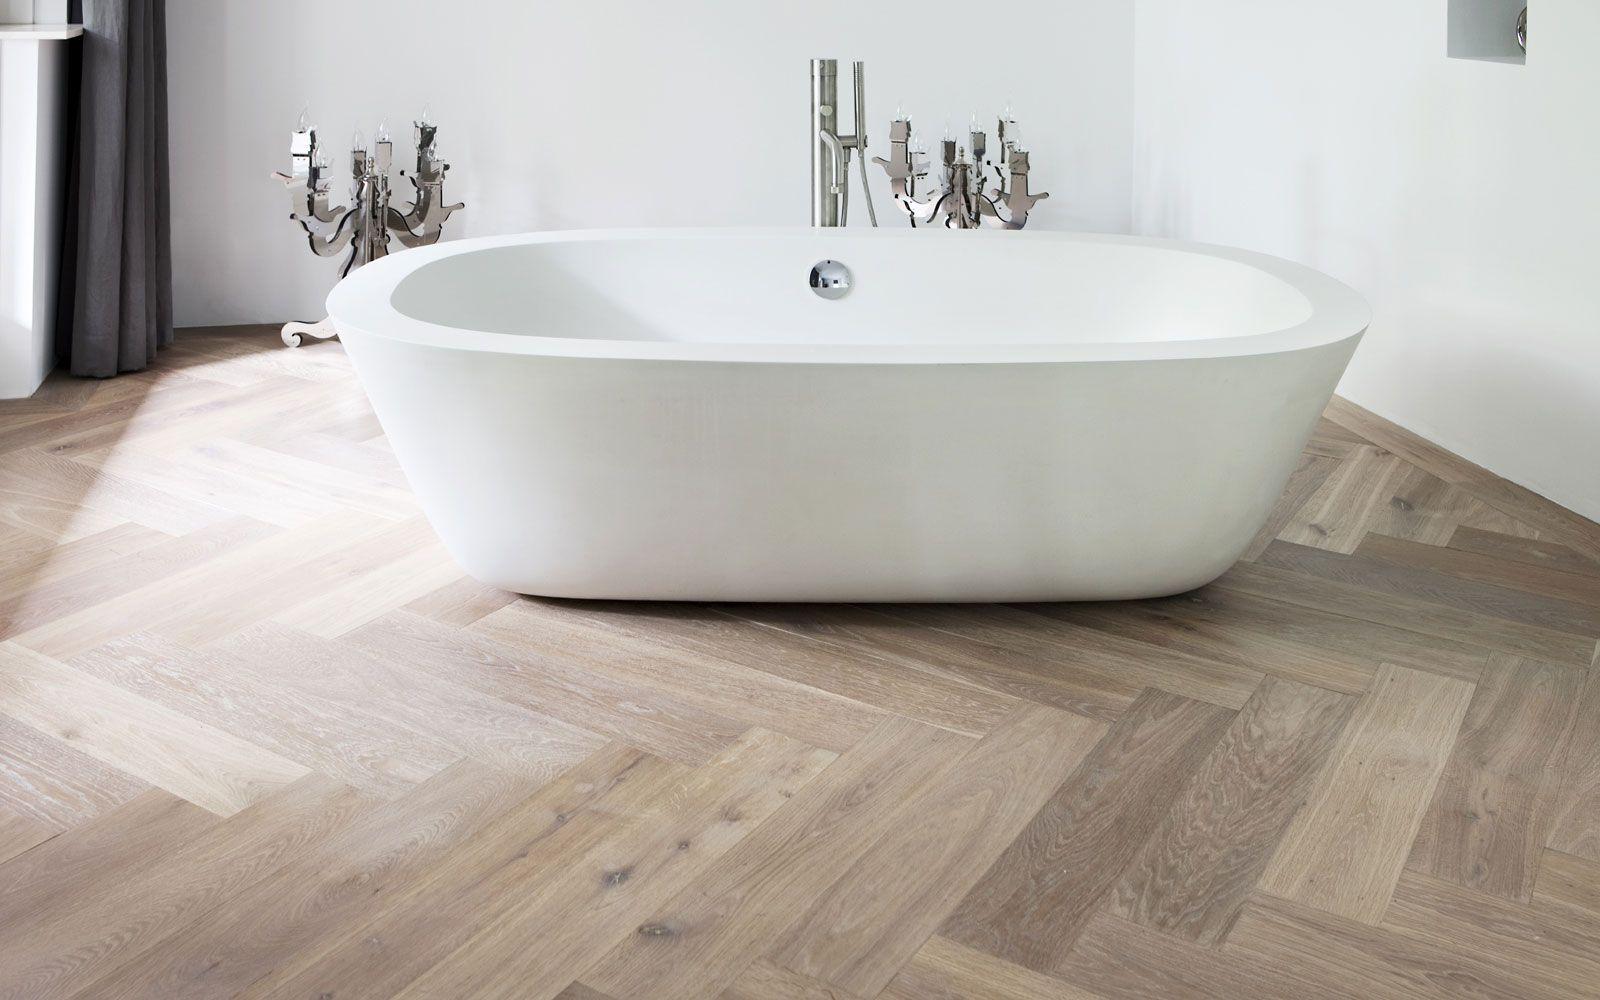 Moderne Visgraat Vloer : Keramiek parket of eiken houten visgraatvloer in de badkamer